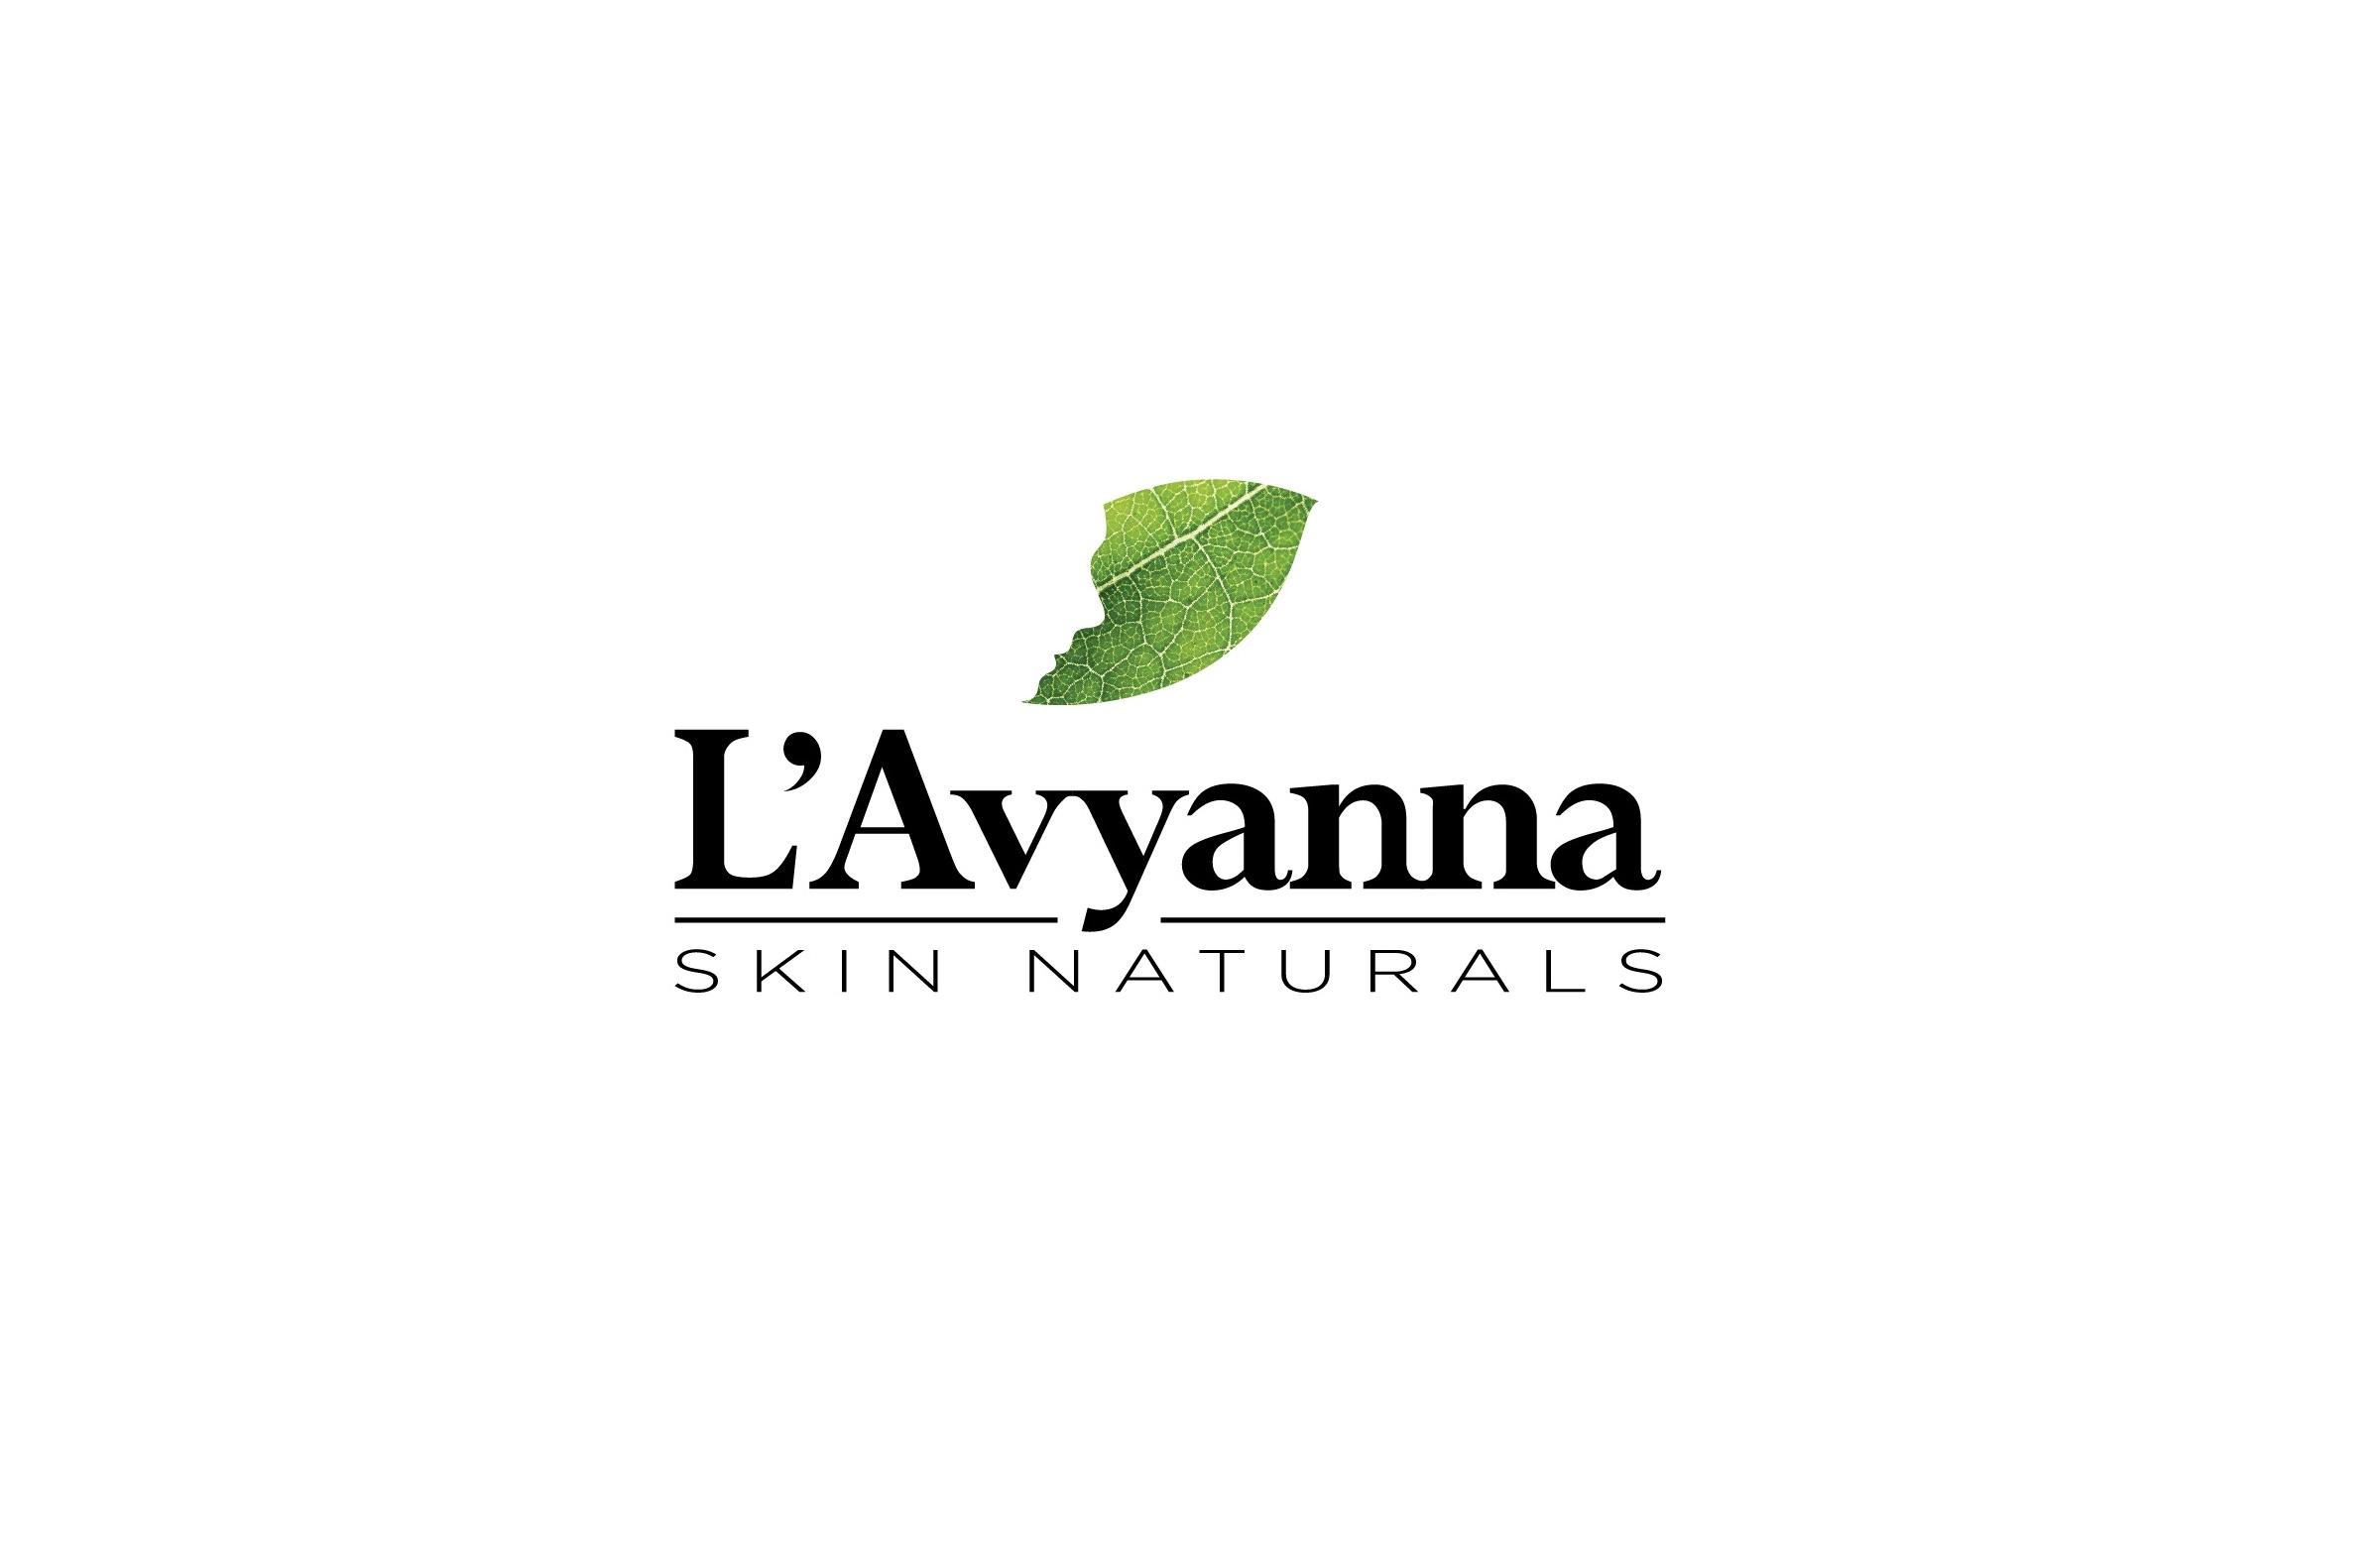 L'Avyanna logo